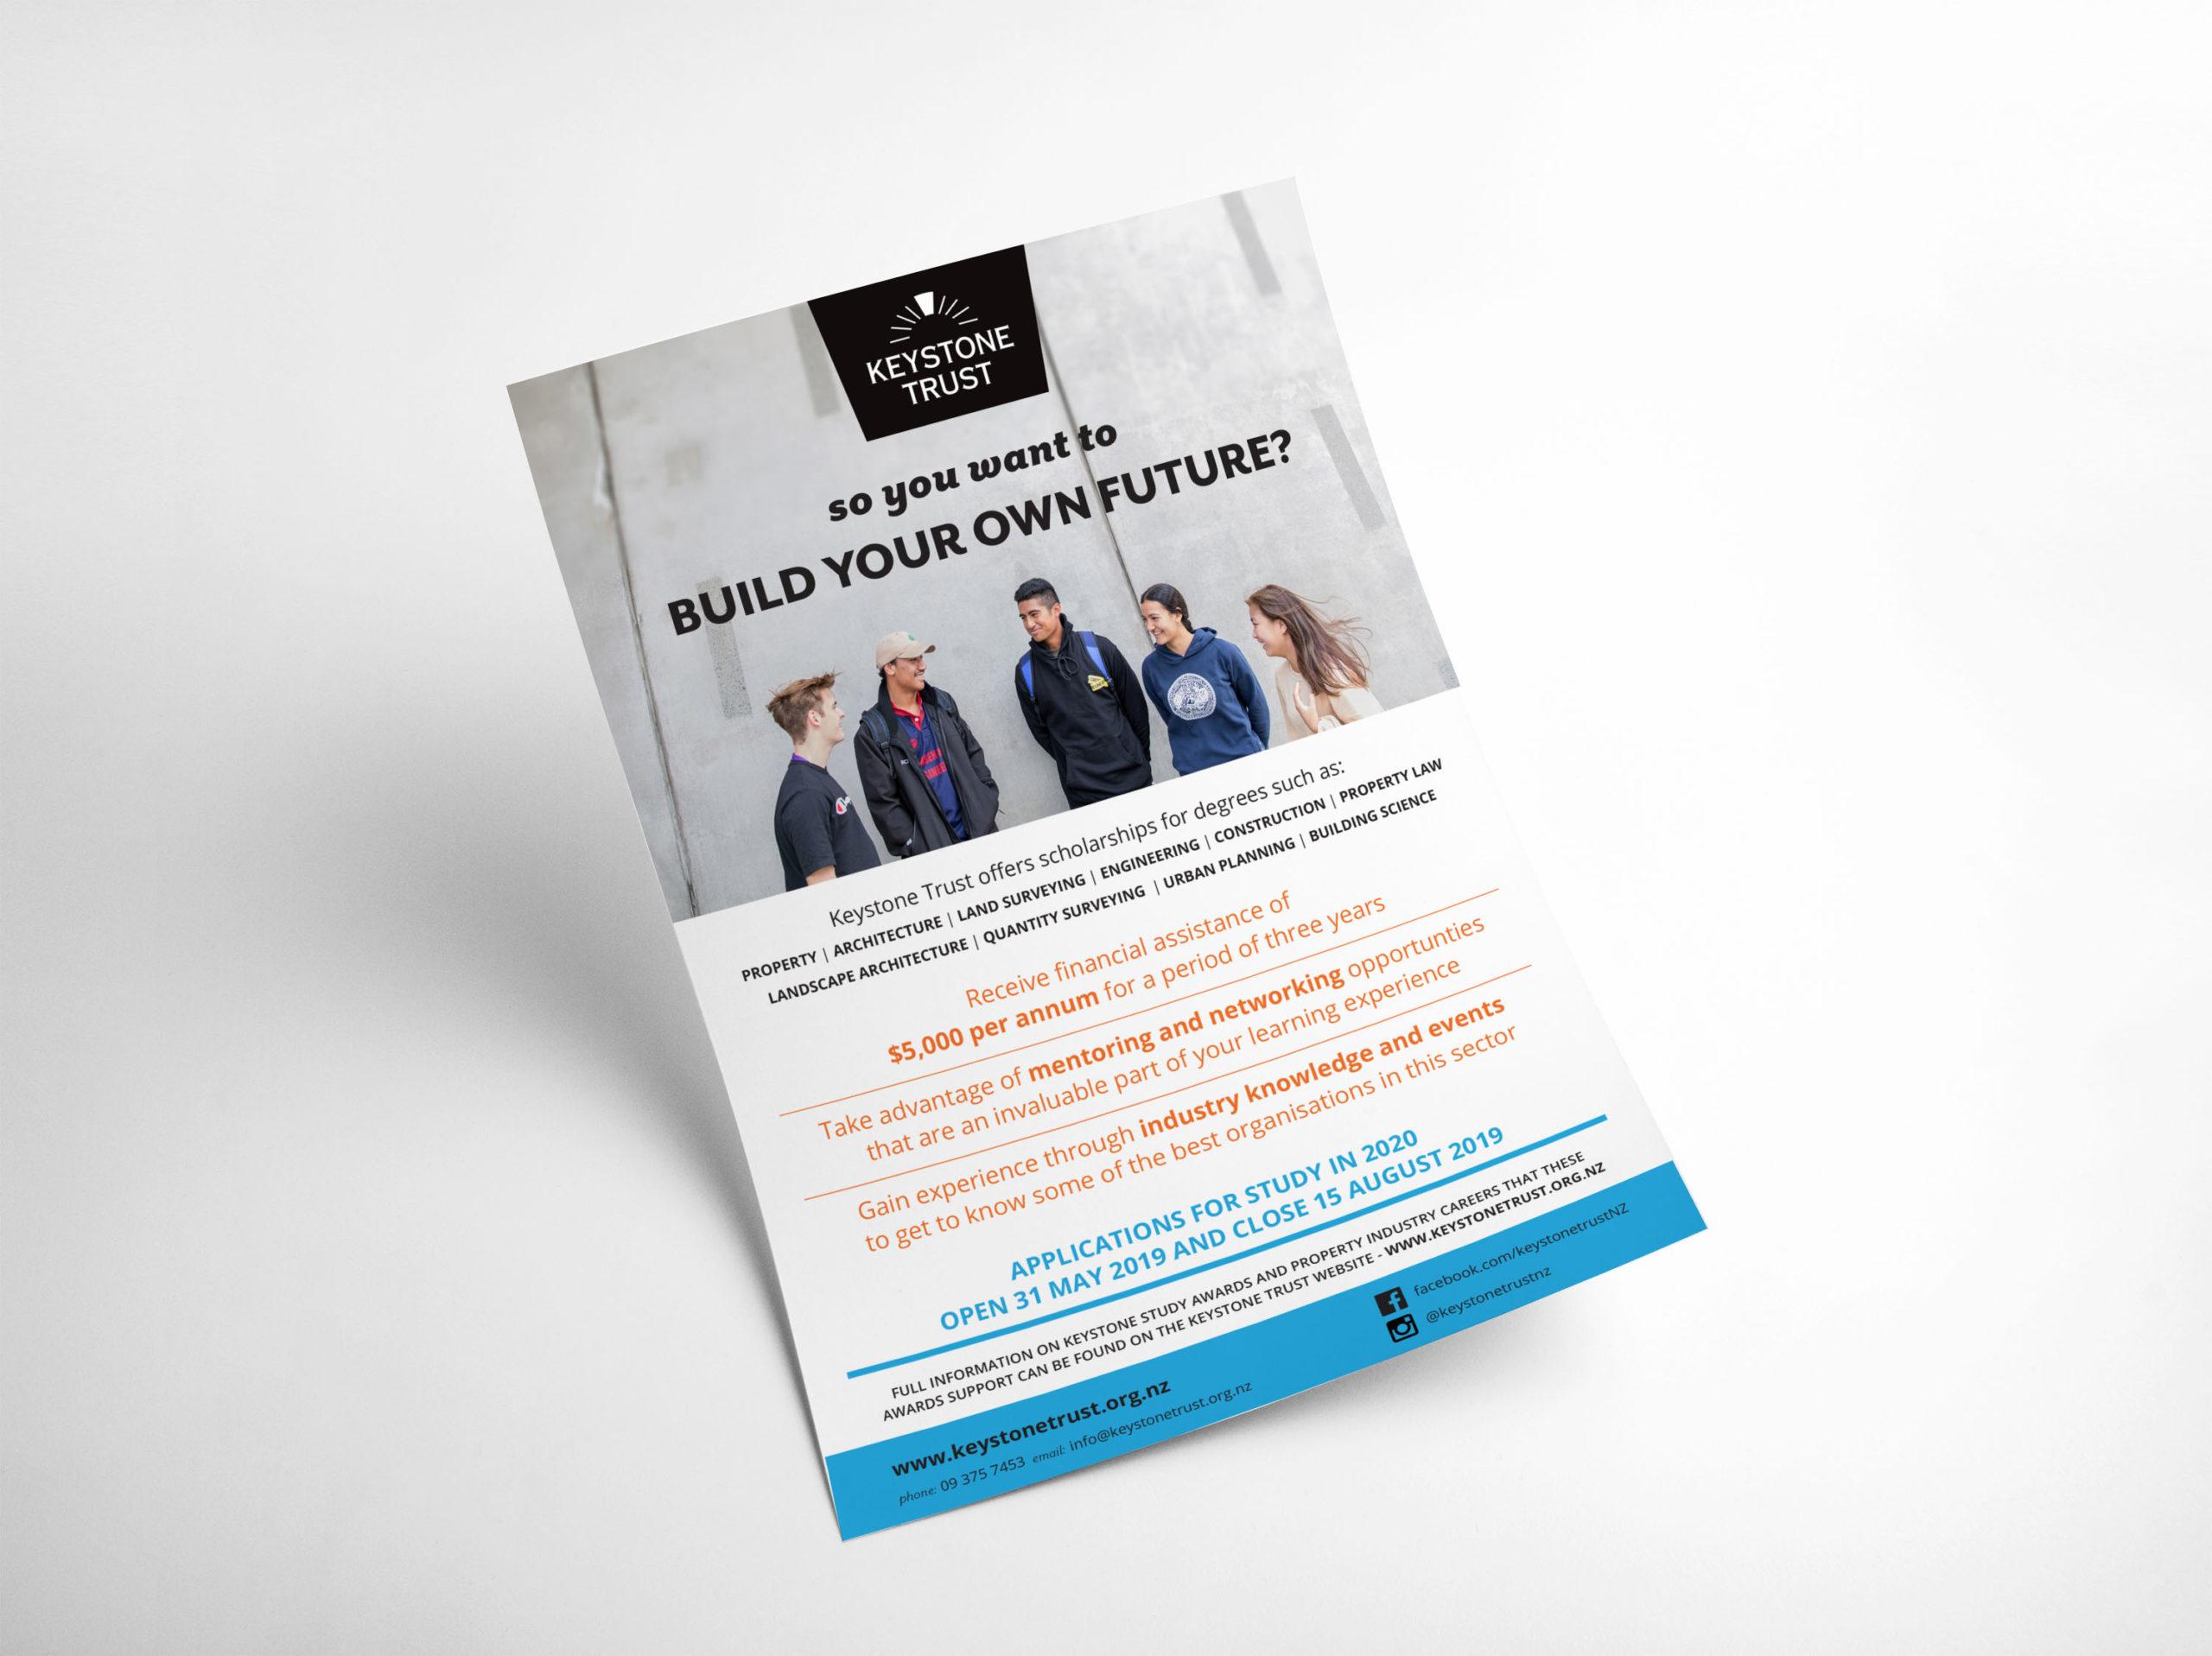 Keystone Trust Build Your Own Future Flyer A4 Mockup